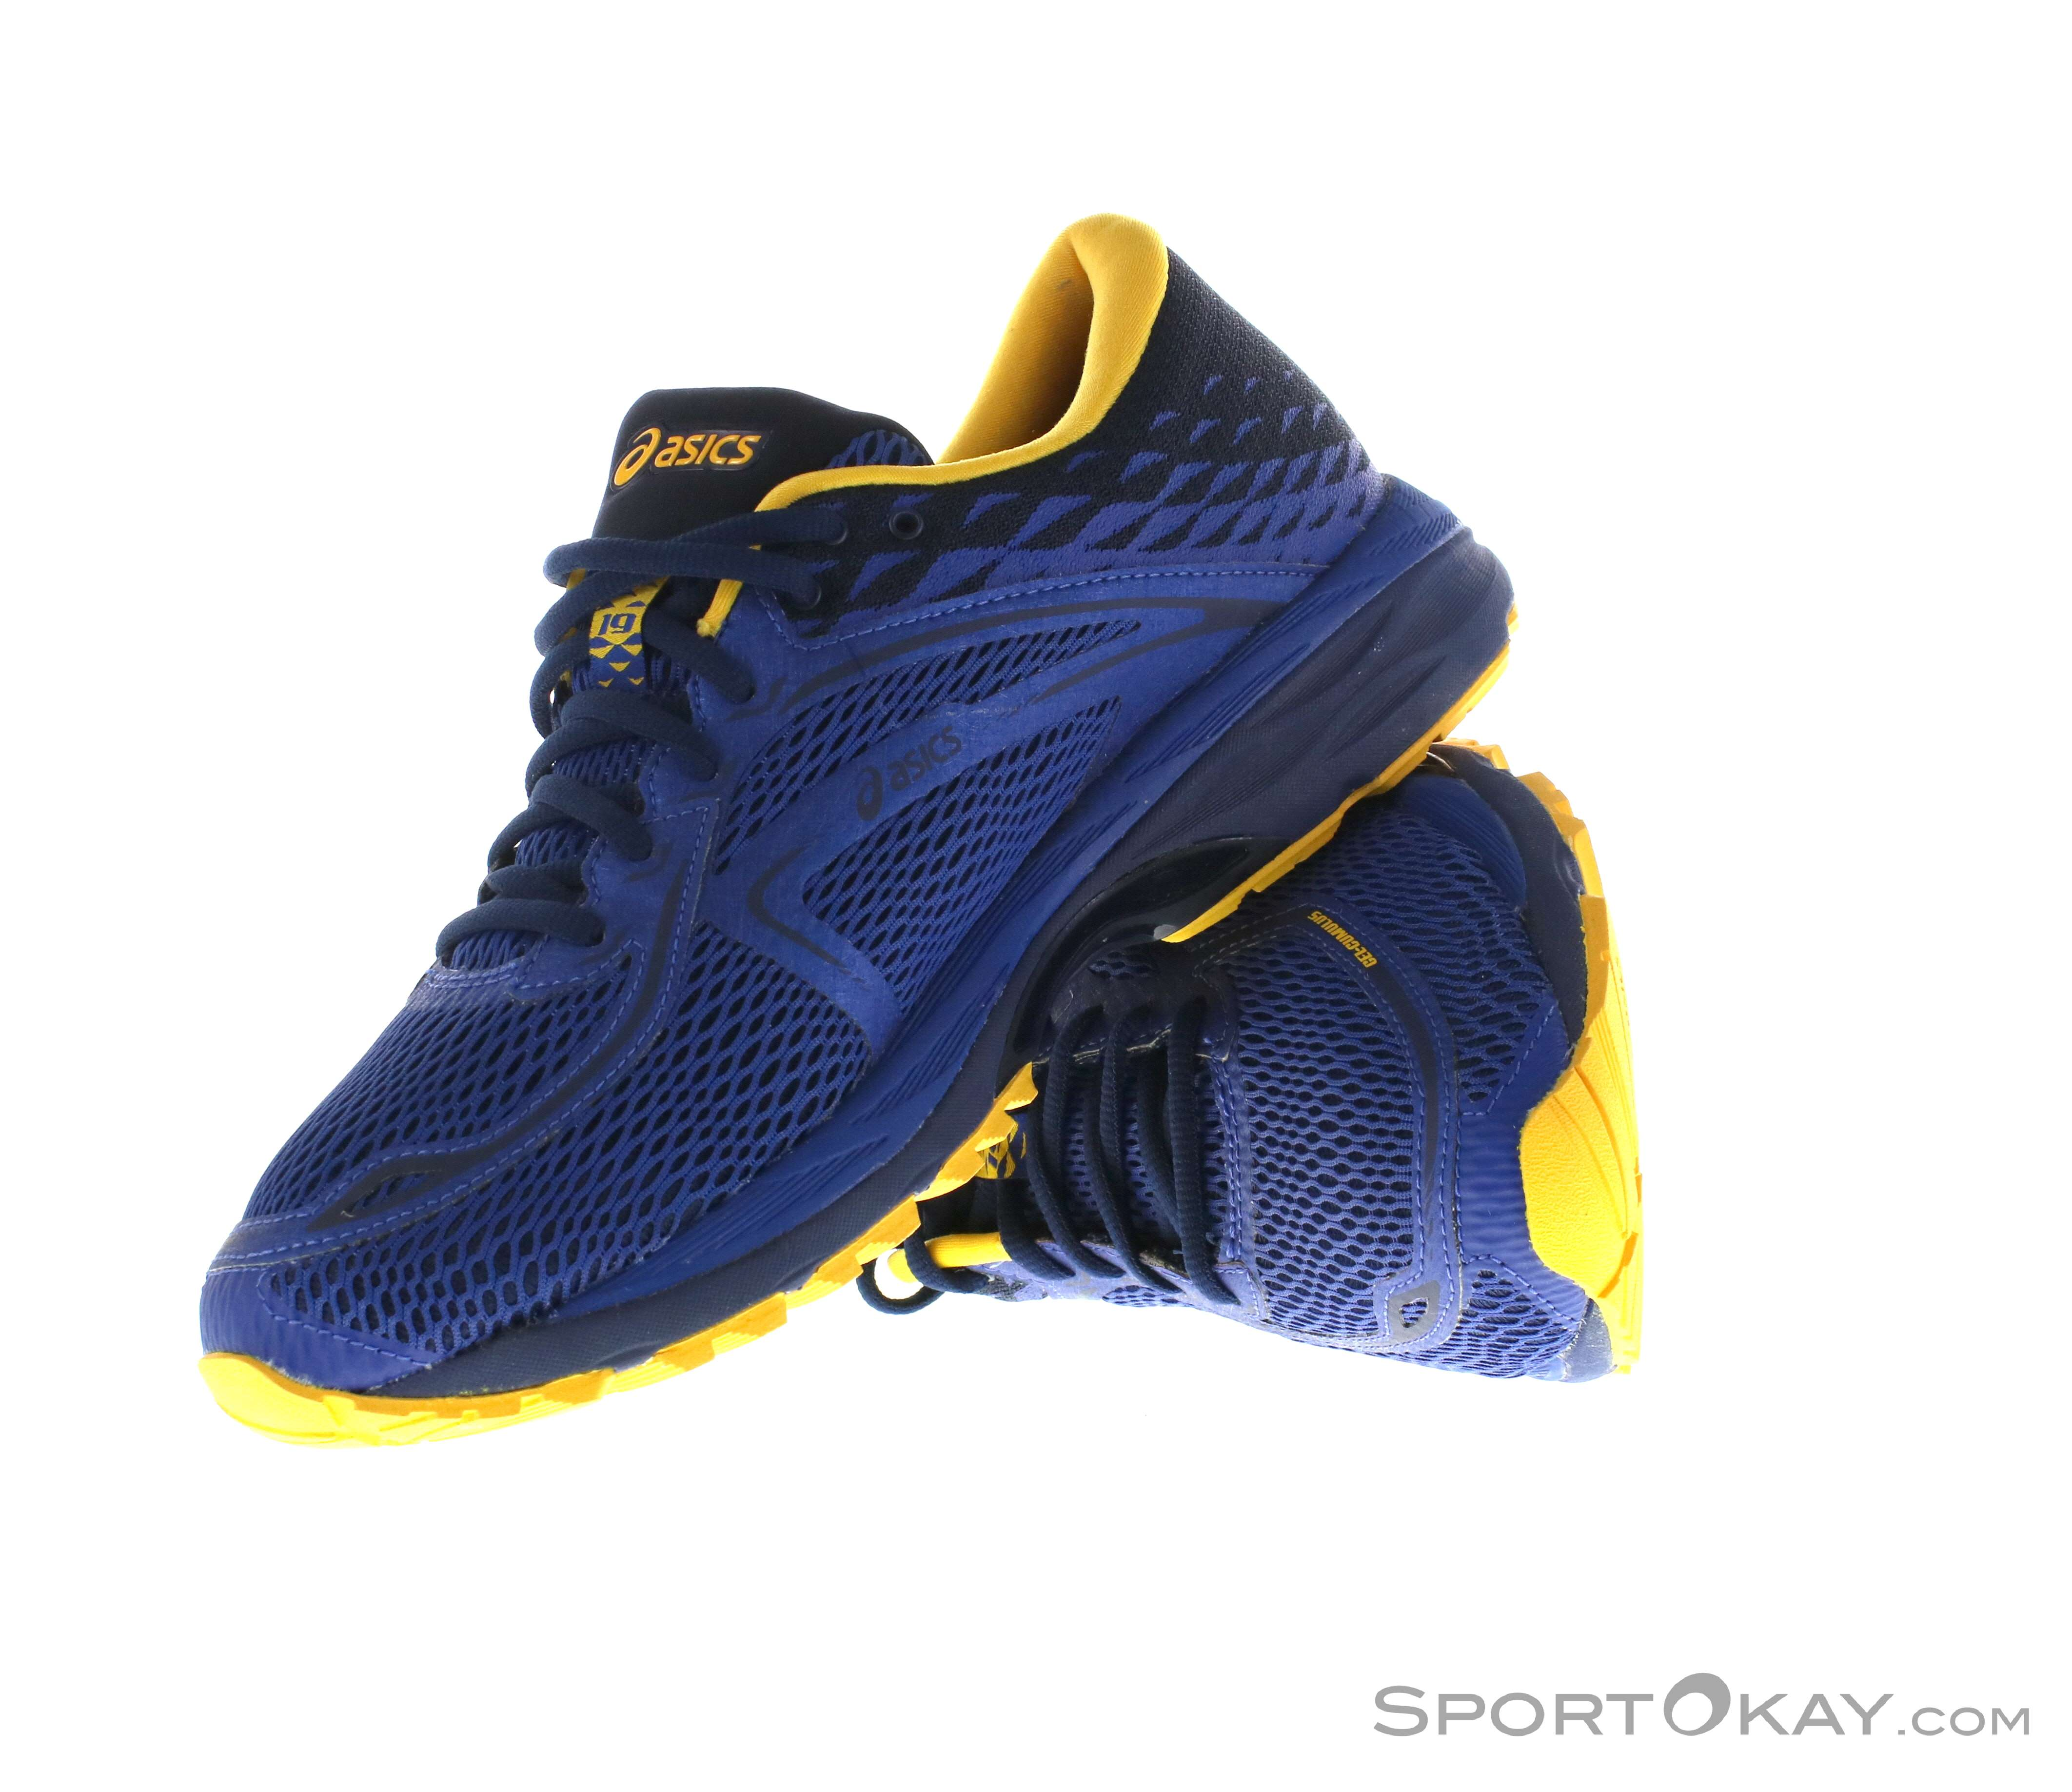 Mens Gore Gtx Tex Asics 19 All Round Running Shoes Cumulus qYOtf